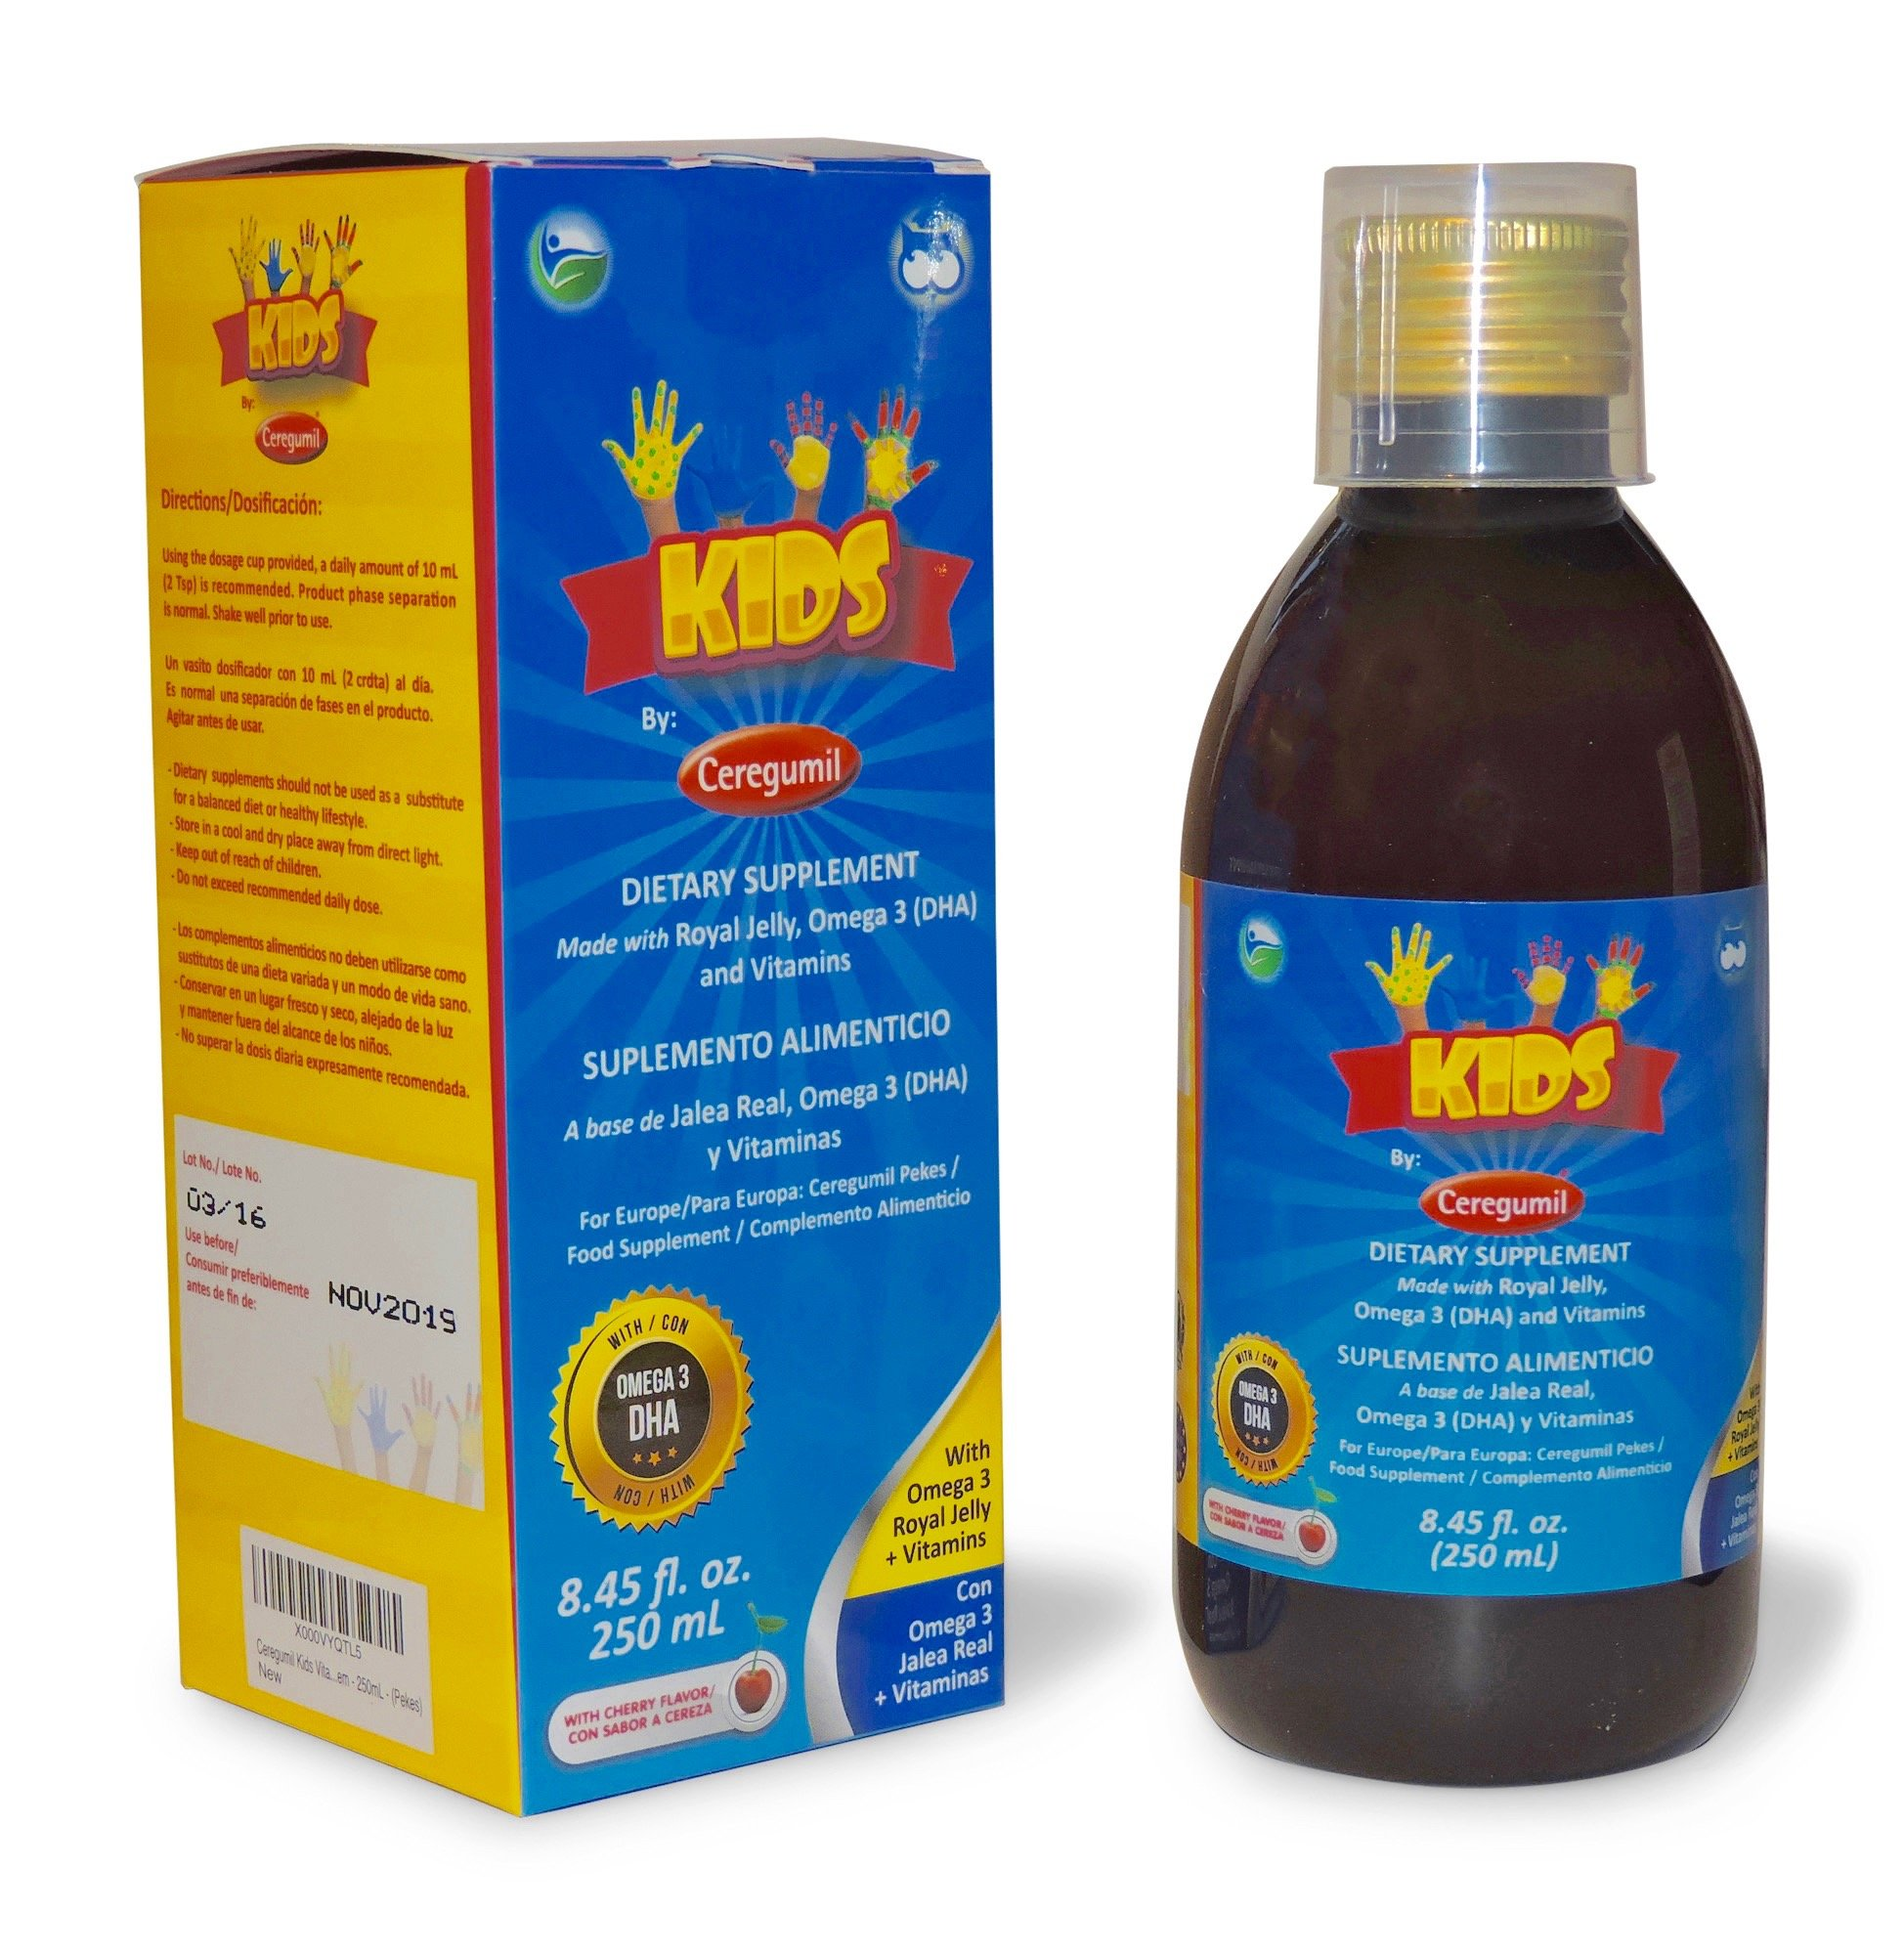 Ceregumil Kids Algae Omega 3 DHA Liquid Daily Multivitamin w/Vitamins C D3 B6 Cyanocobalamin B12 Physical Mental Development Royal Jelly for Growth & Development Excellent Child Nutrition - 250 mL